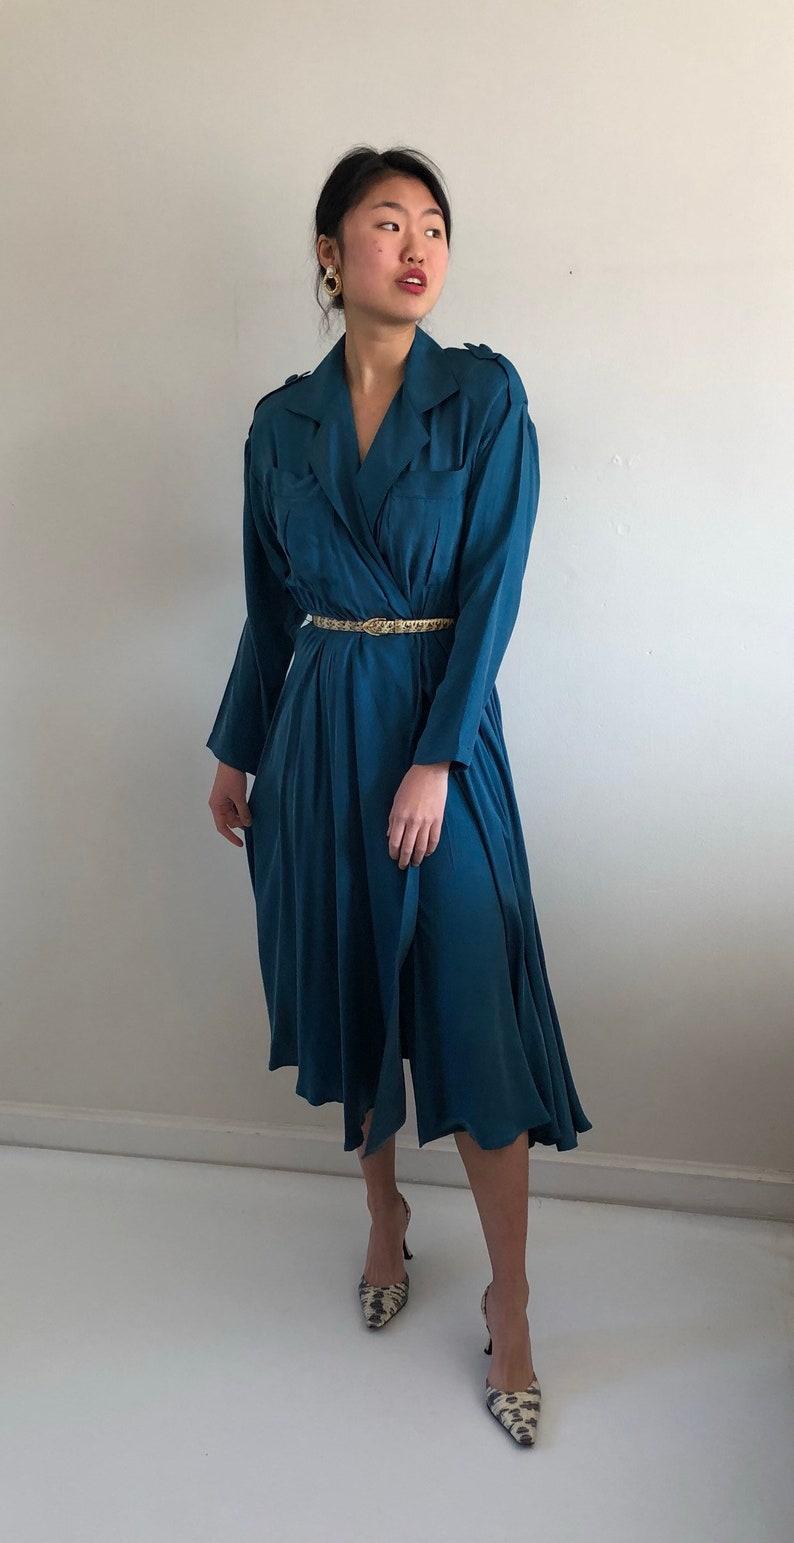 80s silk wrap dress   cerulean blue plunging neckline wrap  406dec1a7